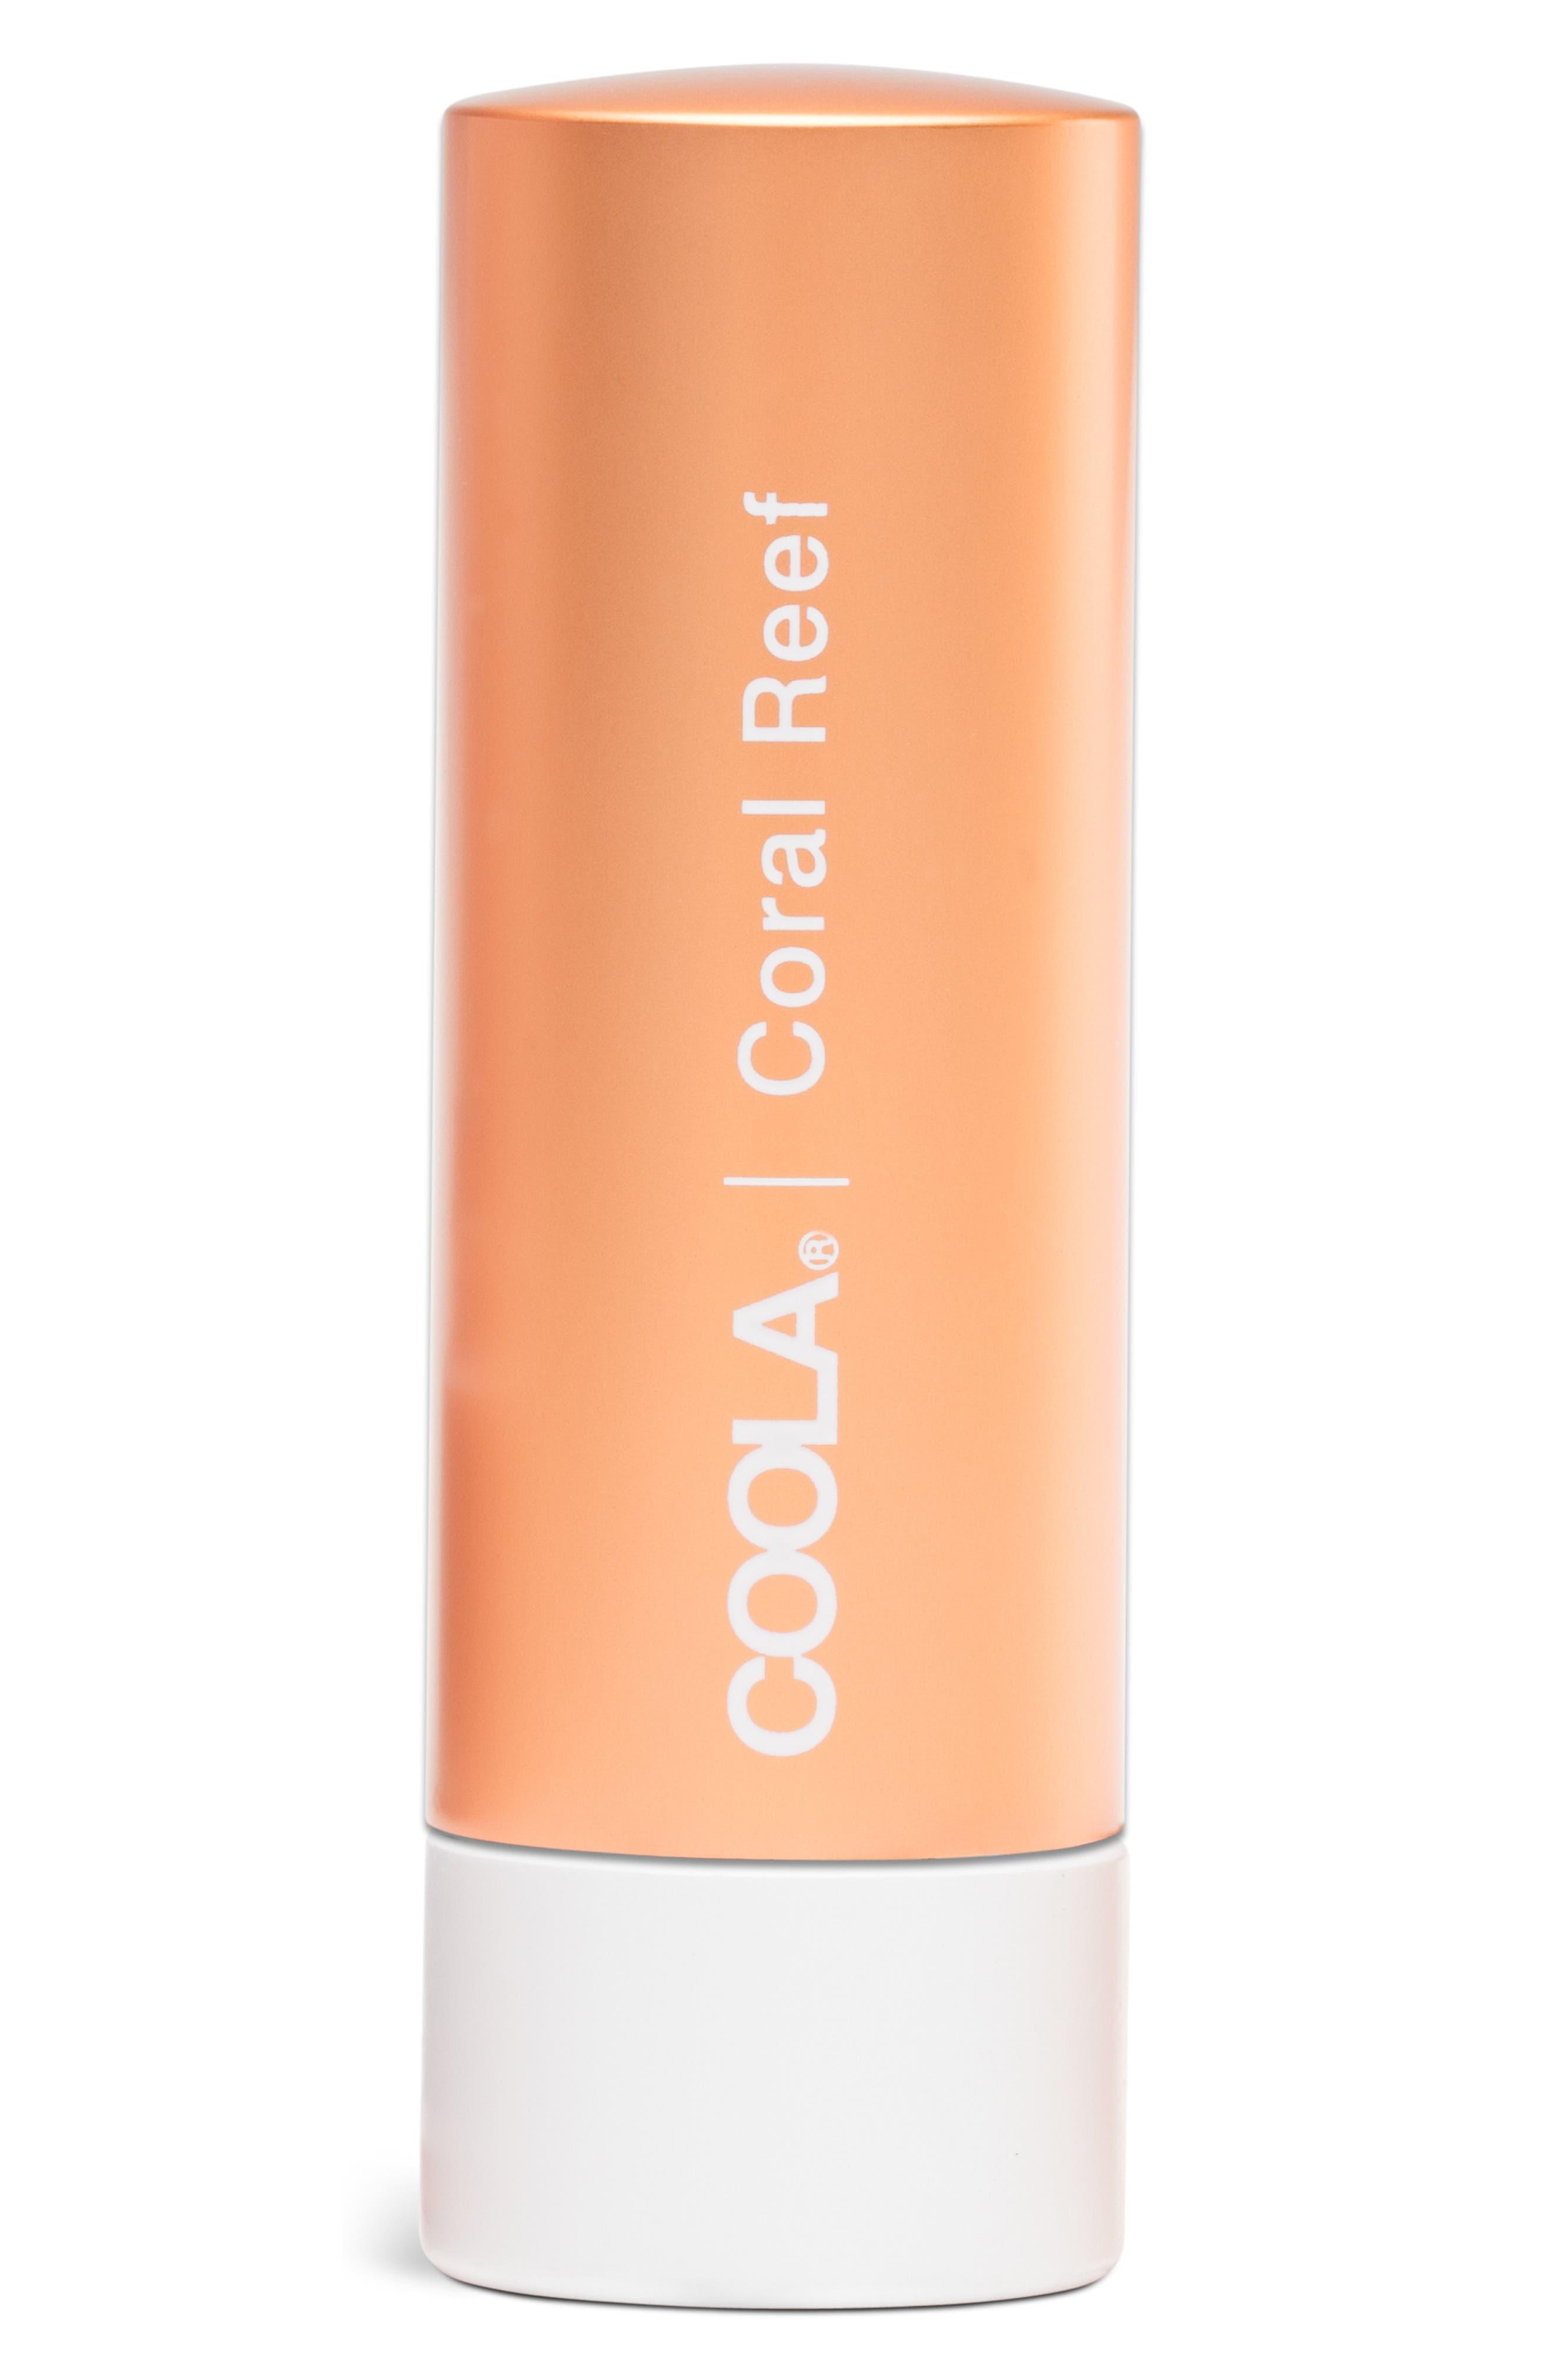 Coola Suncare Mineral Liplux Organic Tinted Lip Balm Spf 30